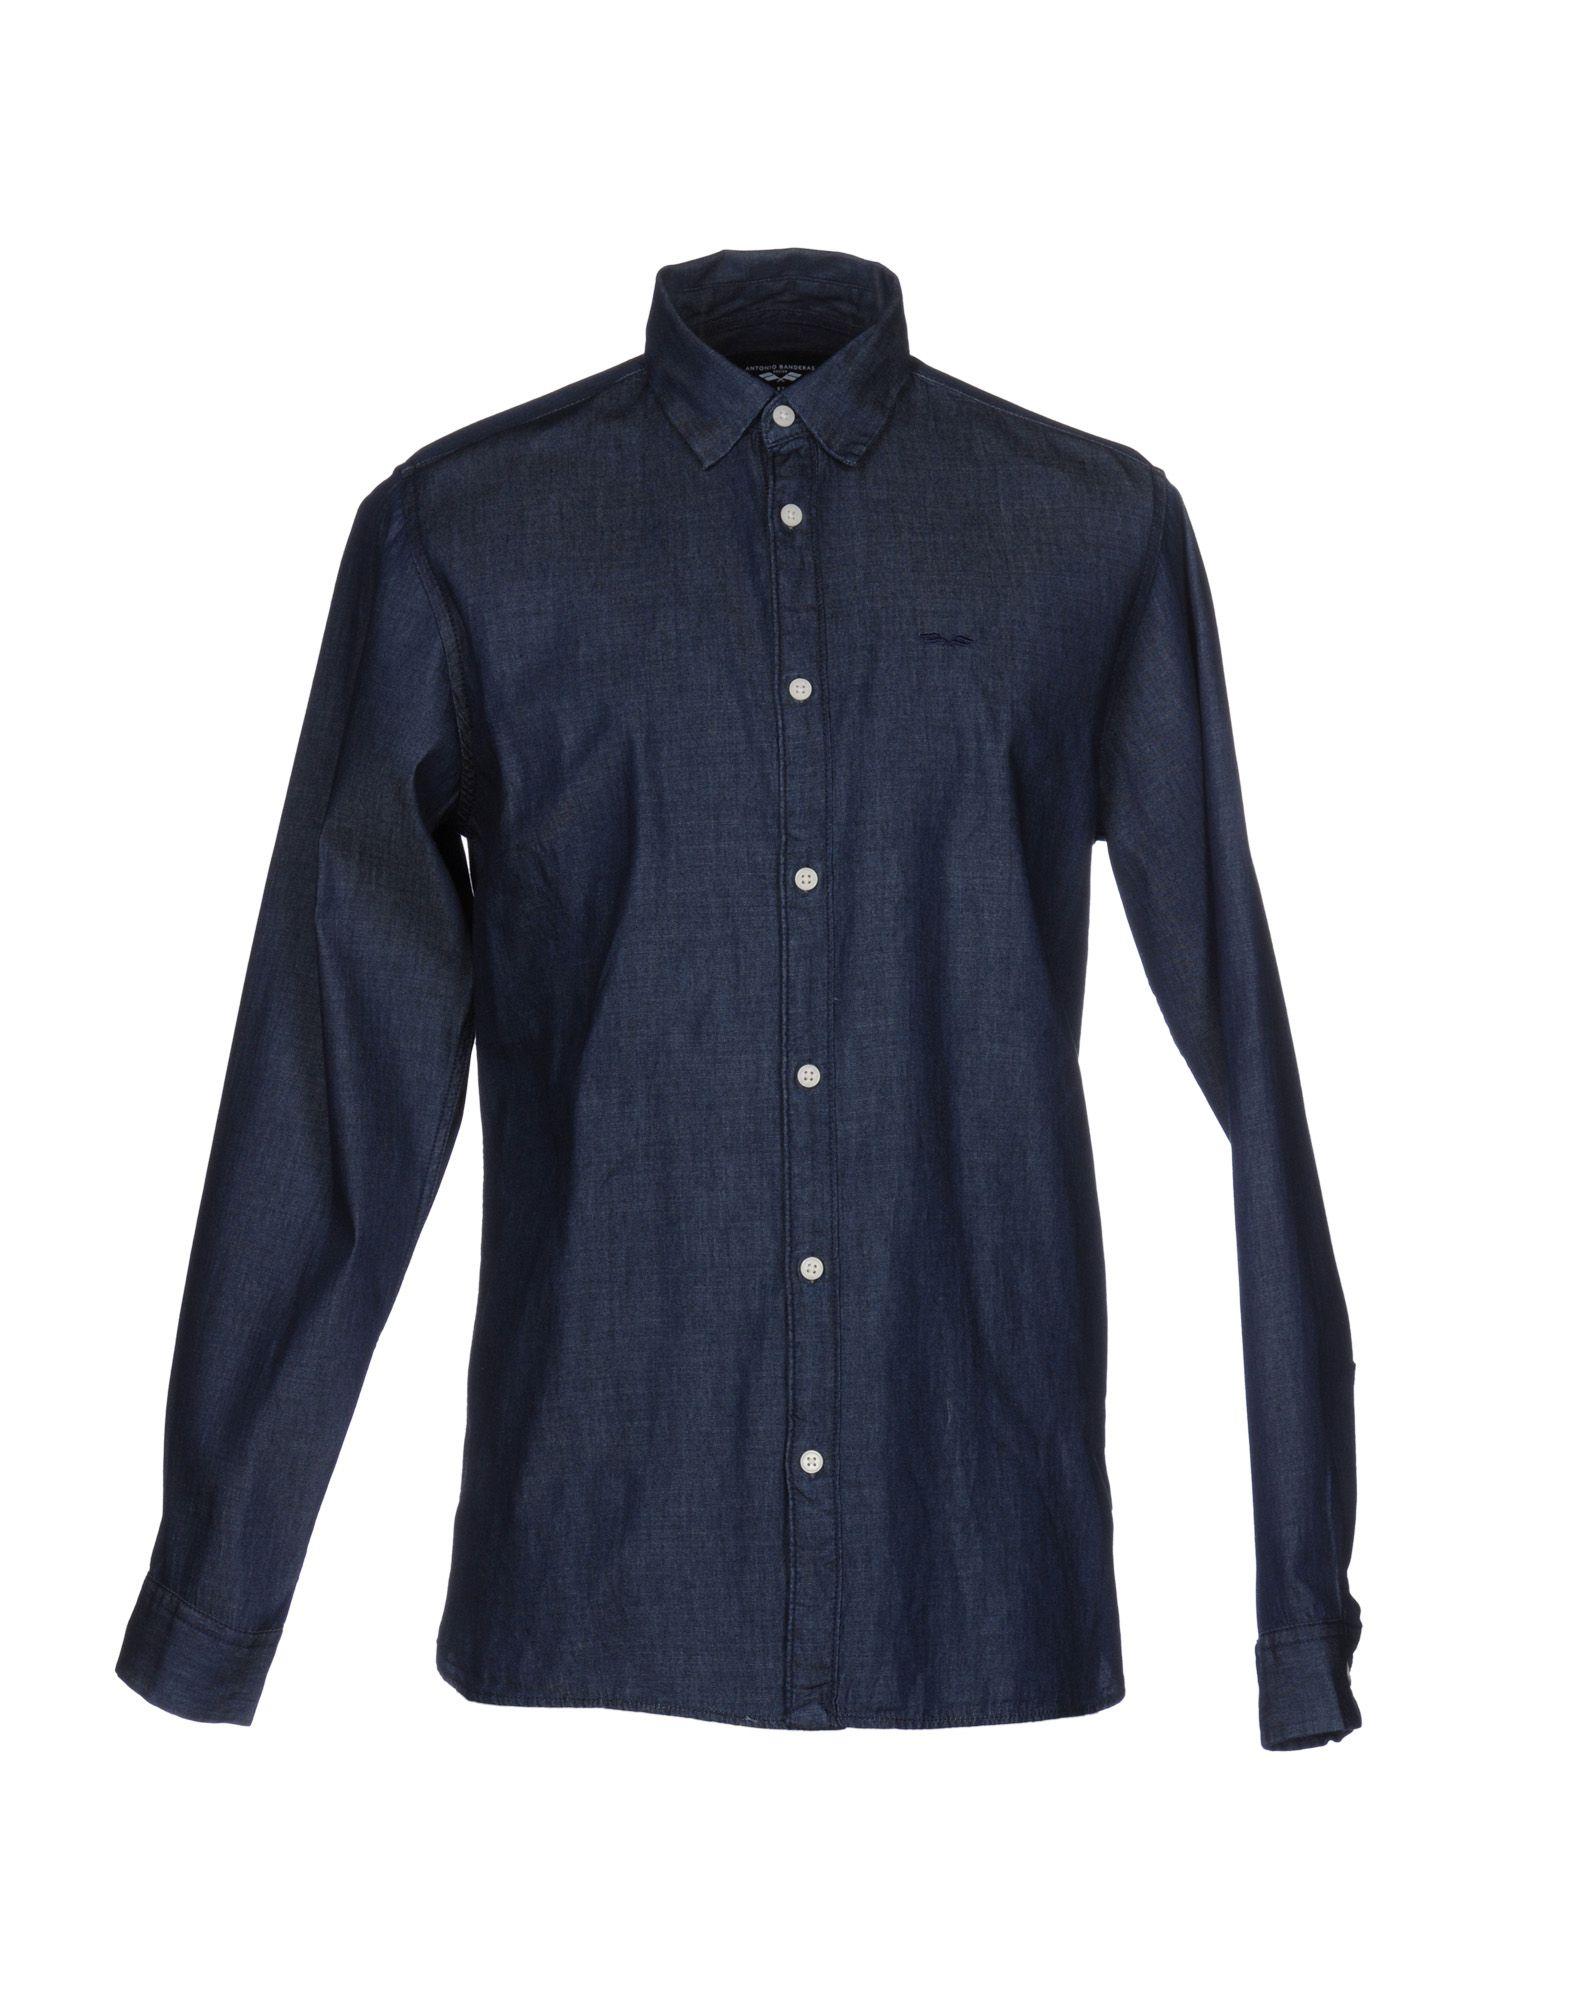 все цены на ANTONIO BANDERAS DESIGN by SELECTED HOMME Джинсовая рубашка онлайн